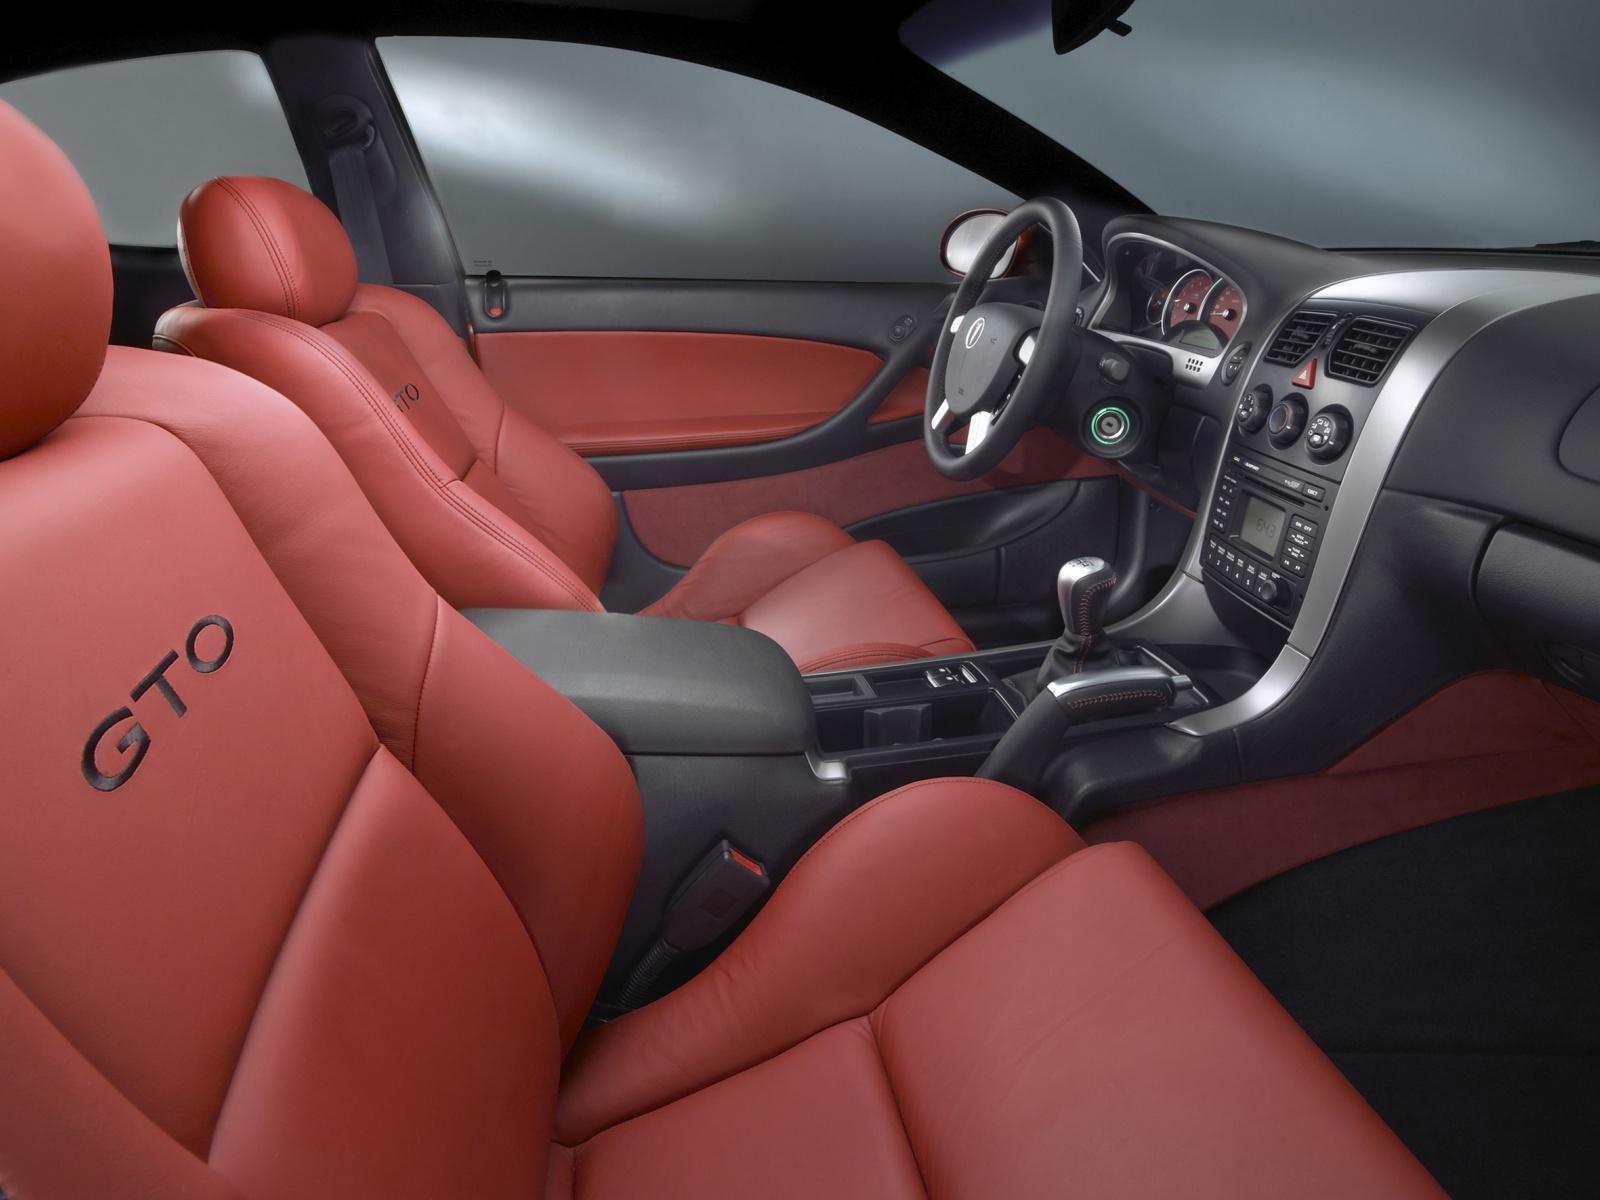 2004 Pontiac Gto Motor Desktop